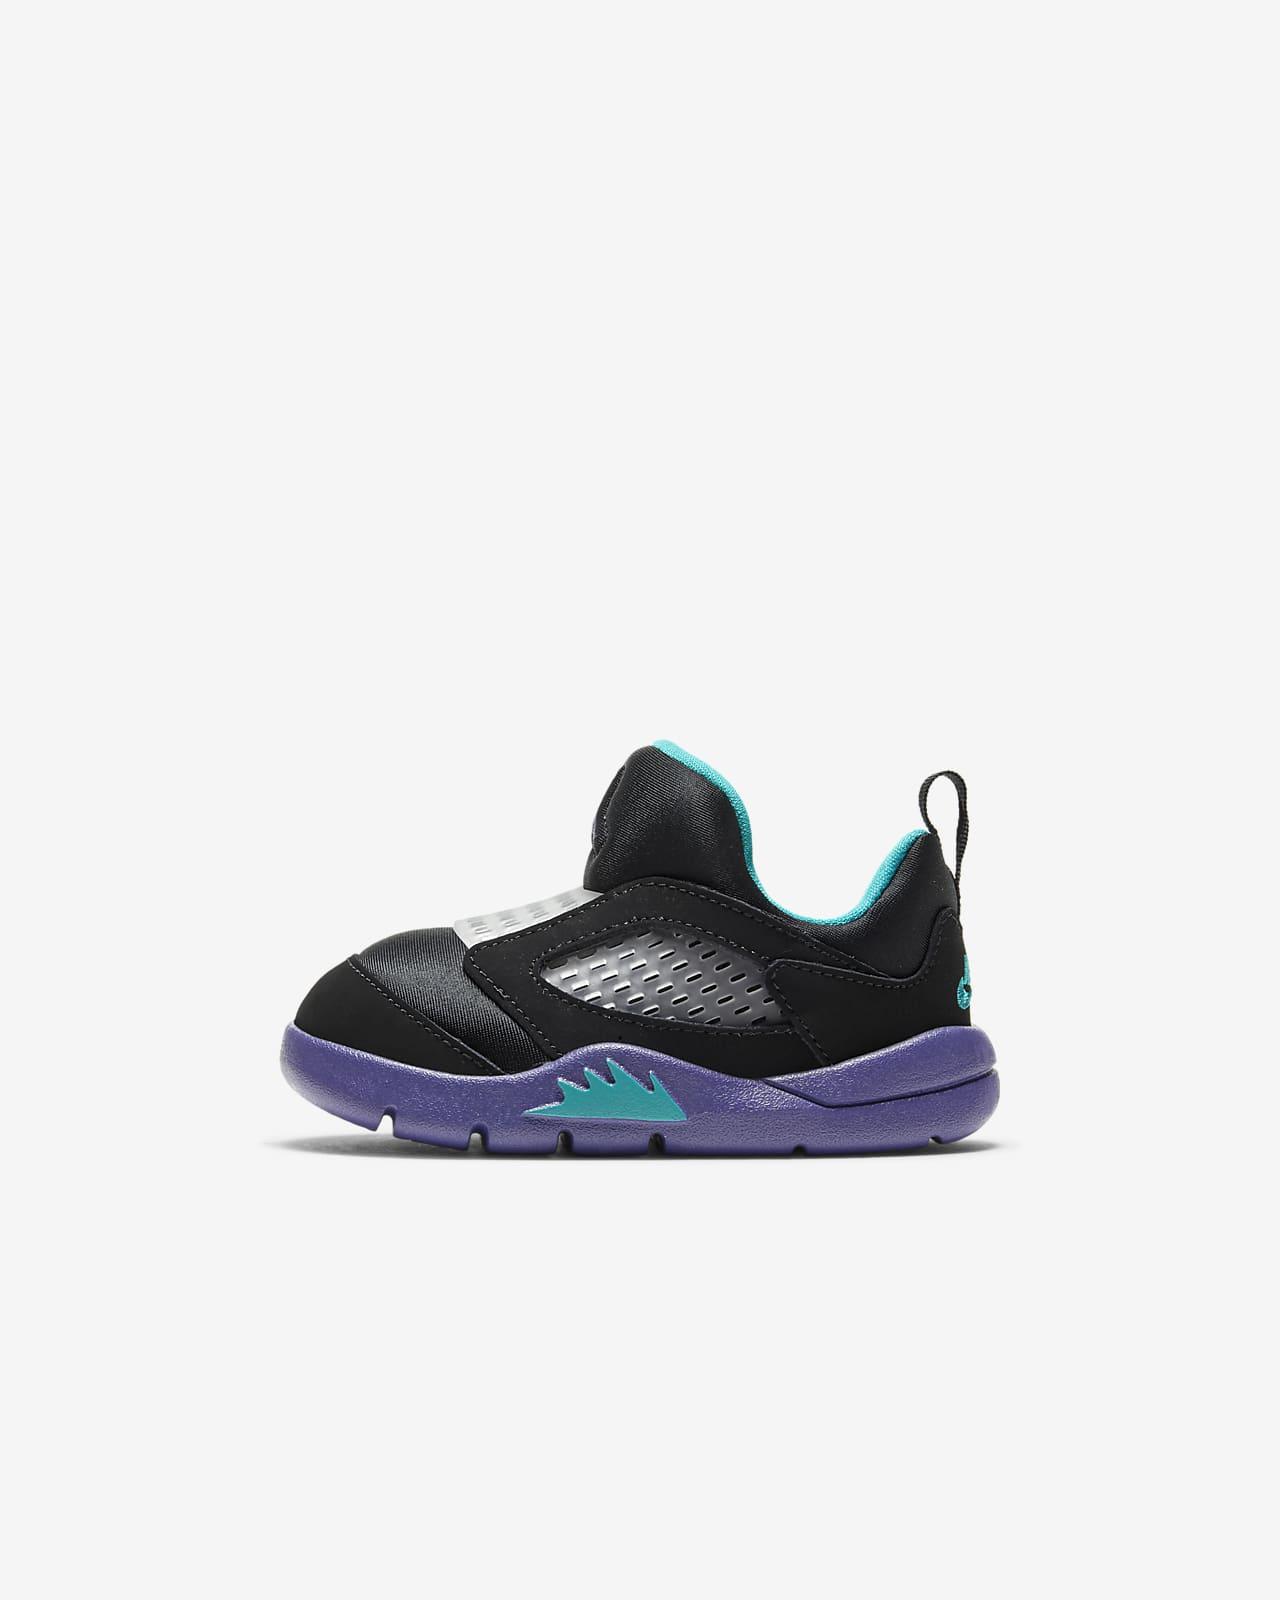 Jordan 5 Retro Little Flex Infant/Toddler Shoe